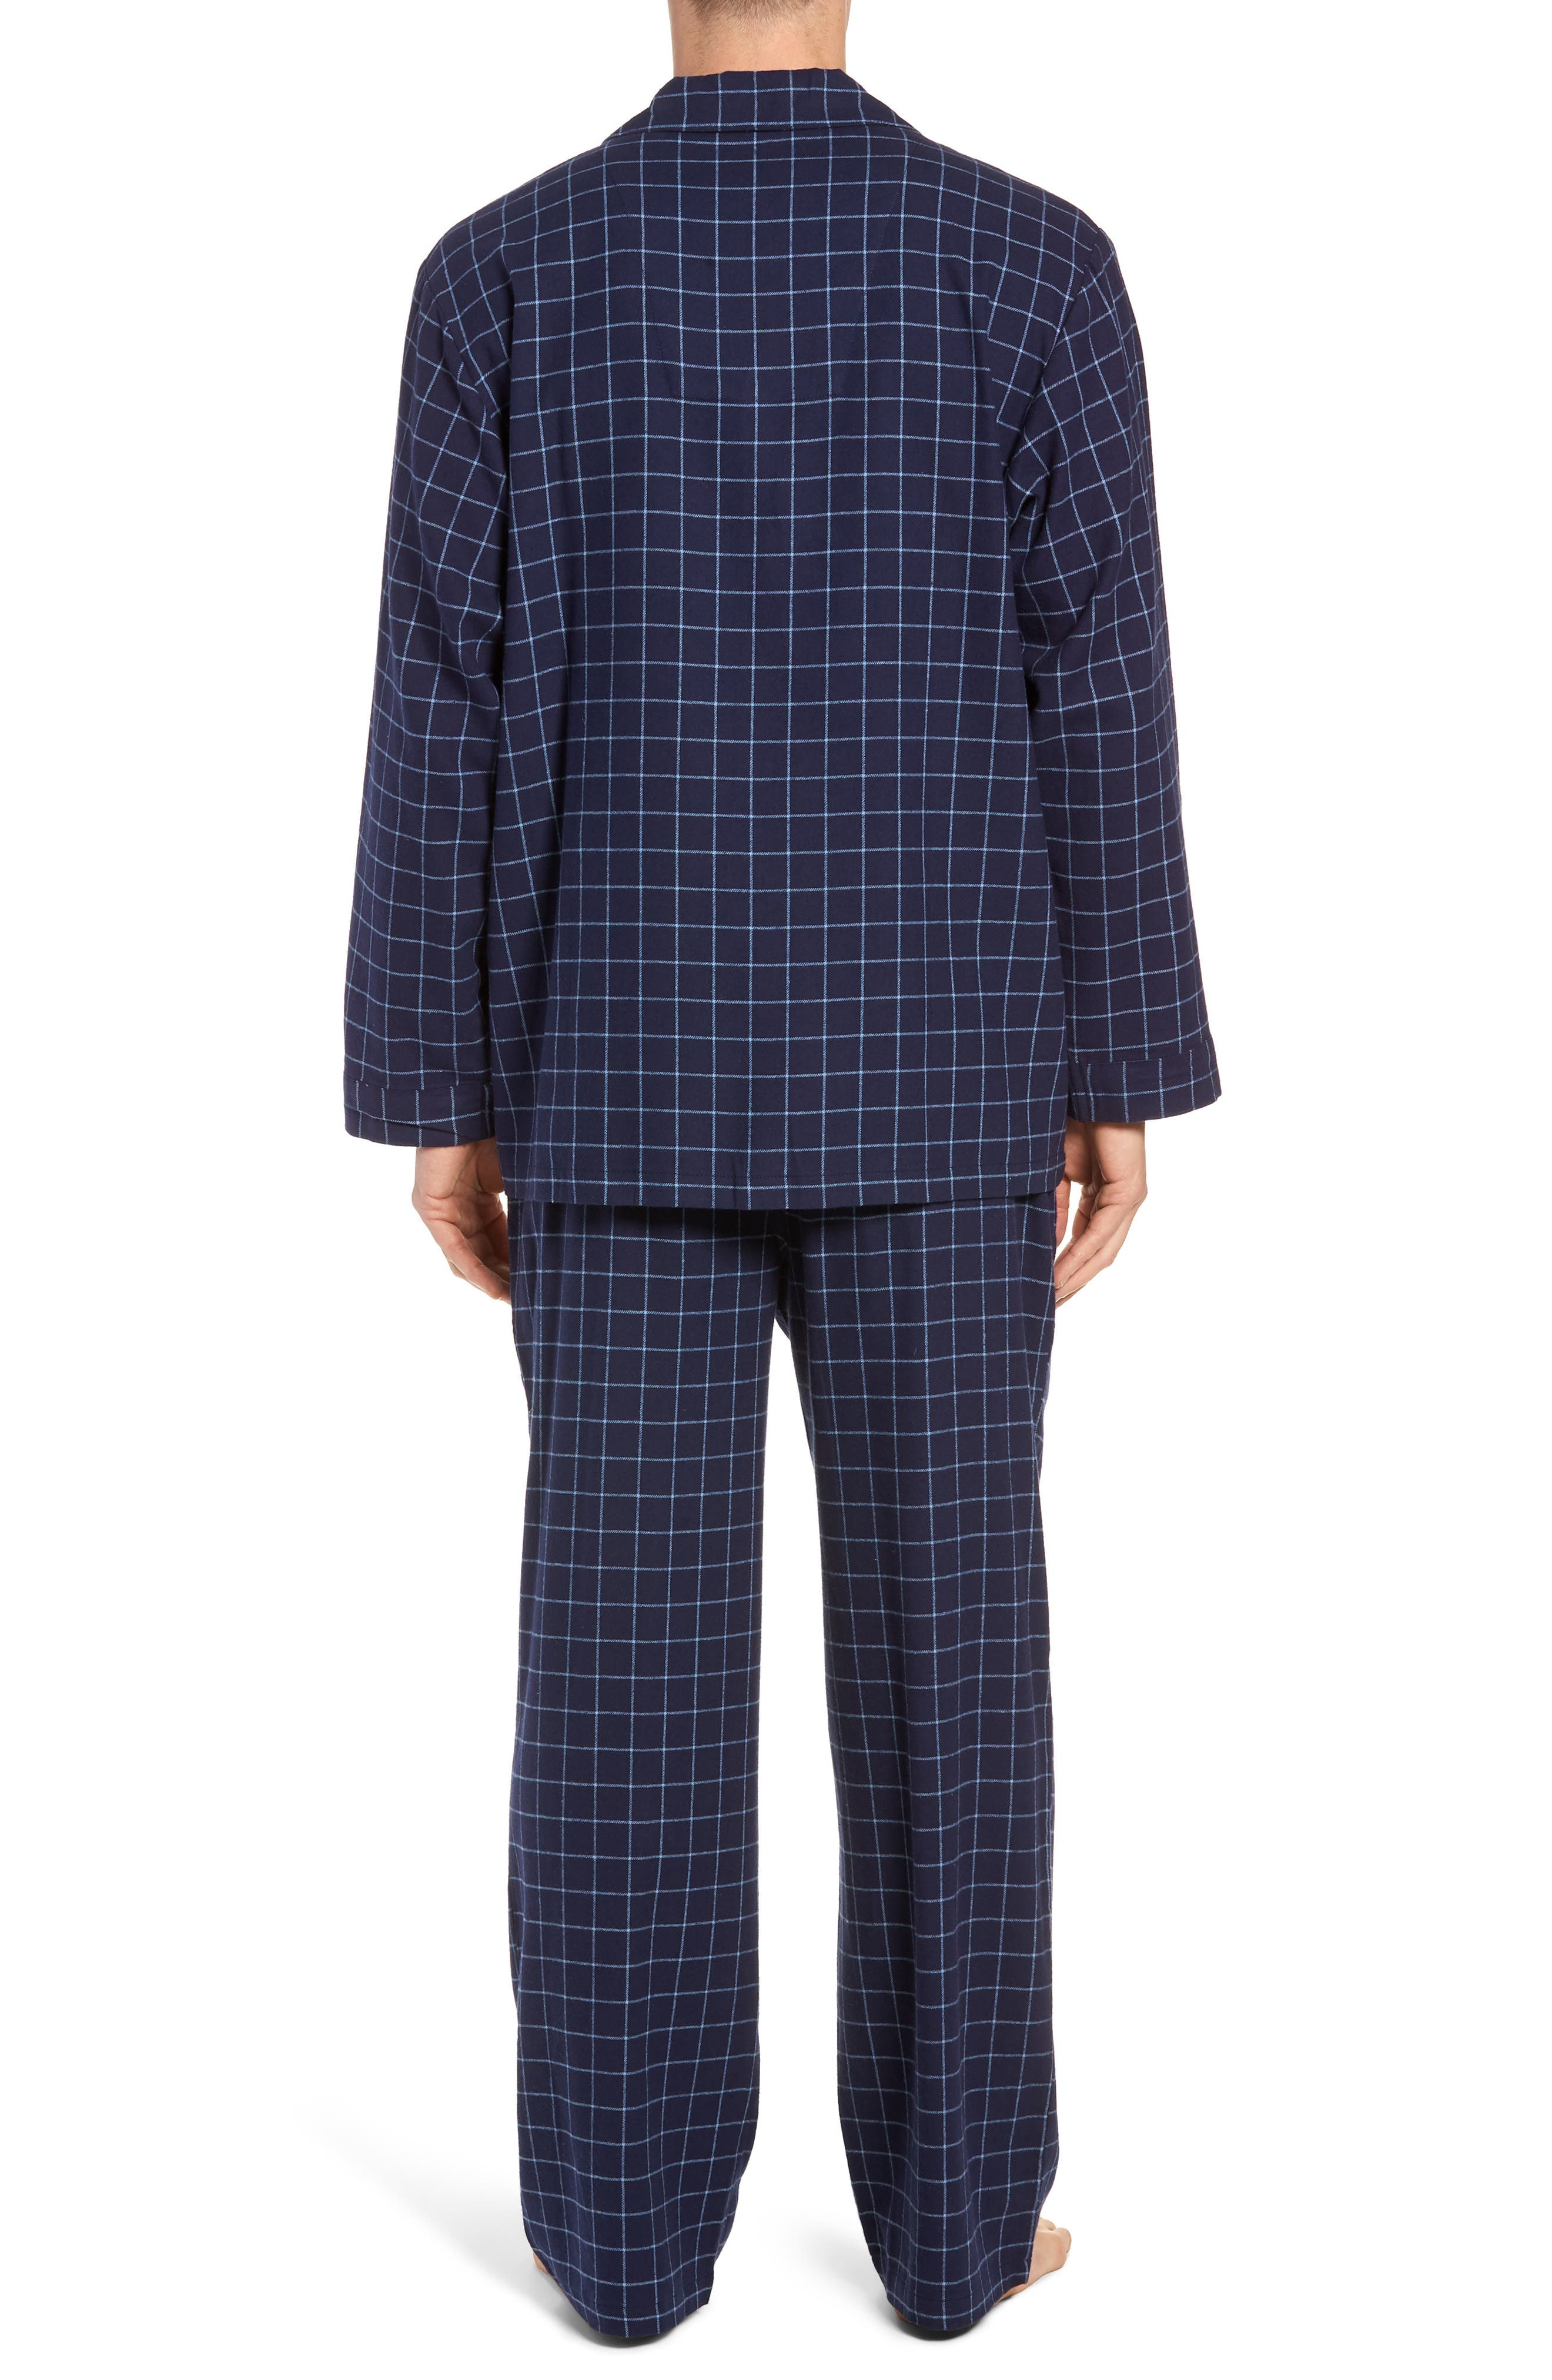 '824' Flannel Pajama Set,                             Alternate thumbnail 35, color,